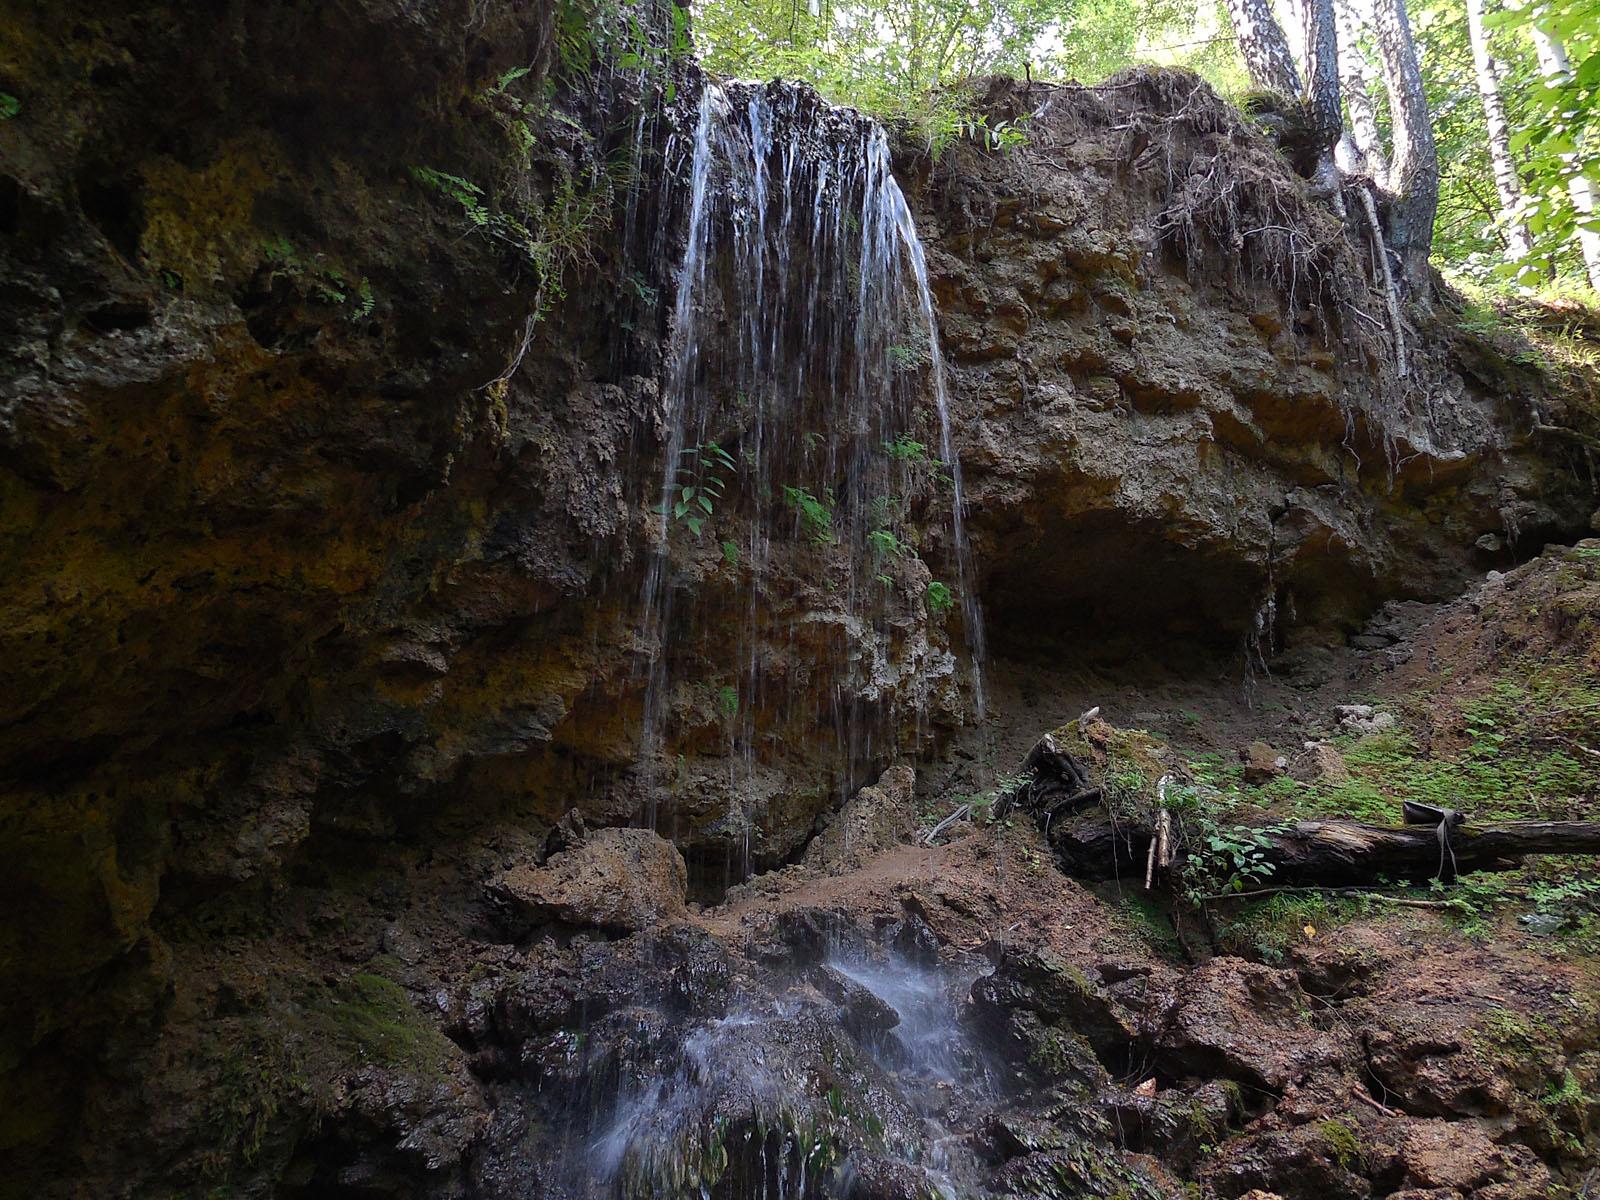 Водопад Серебряный каскад